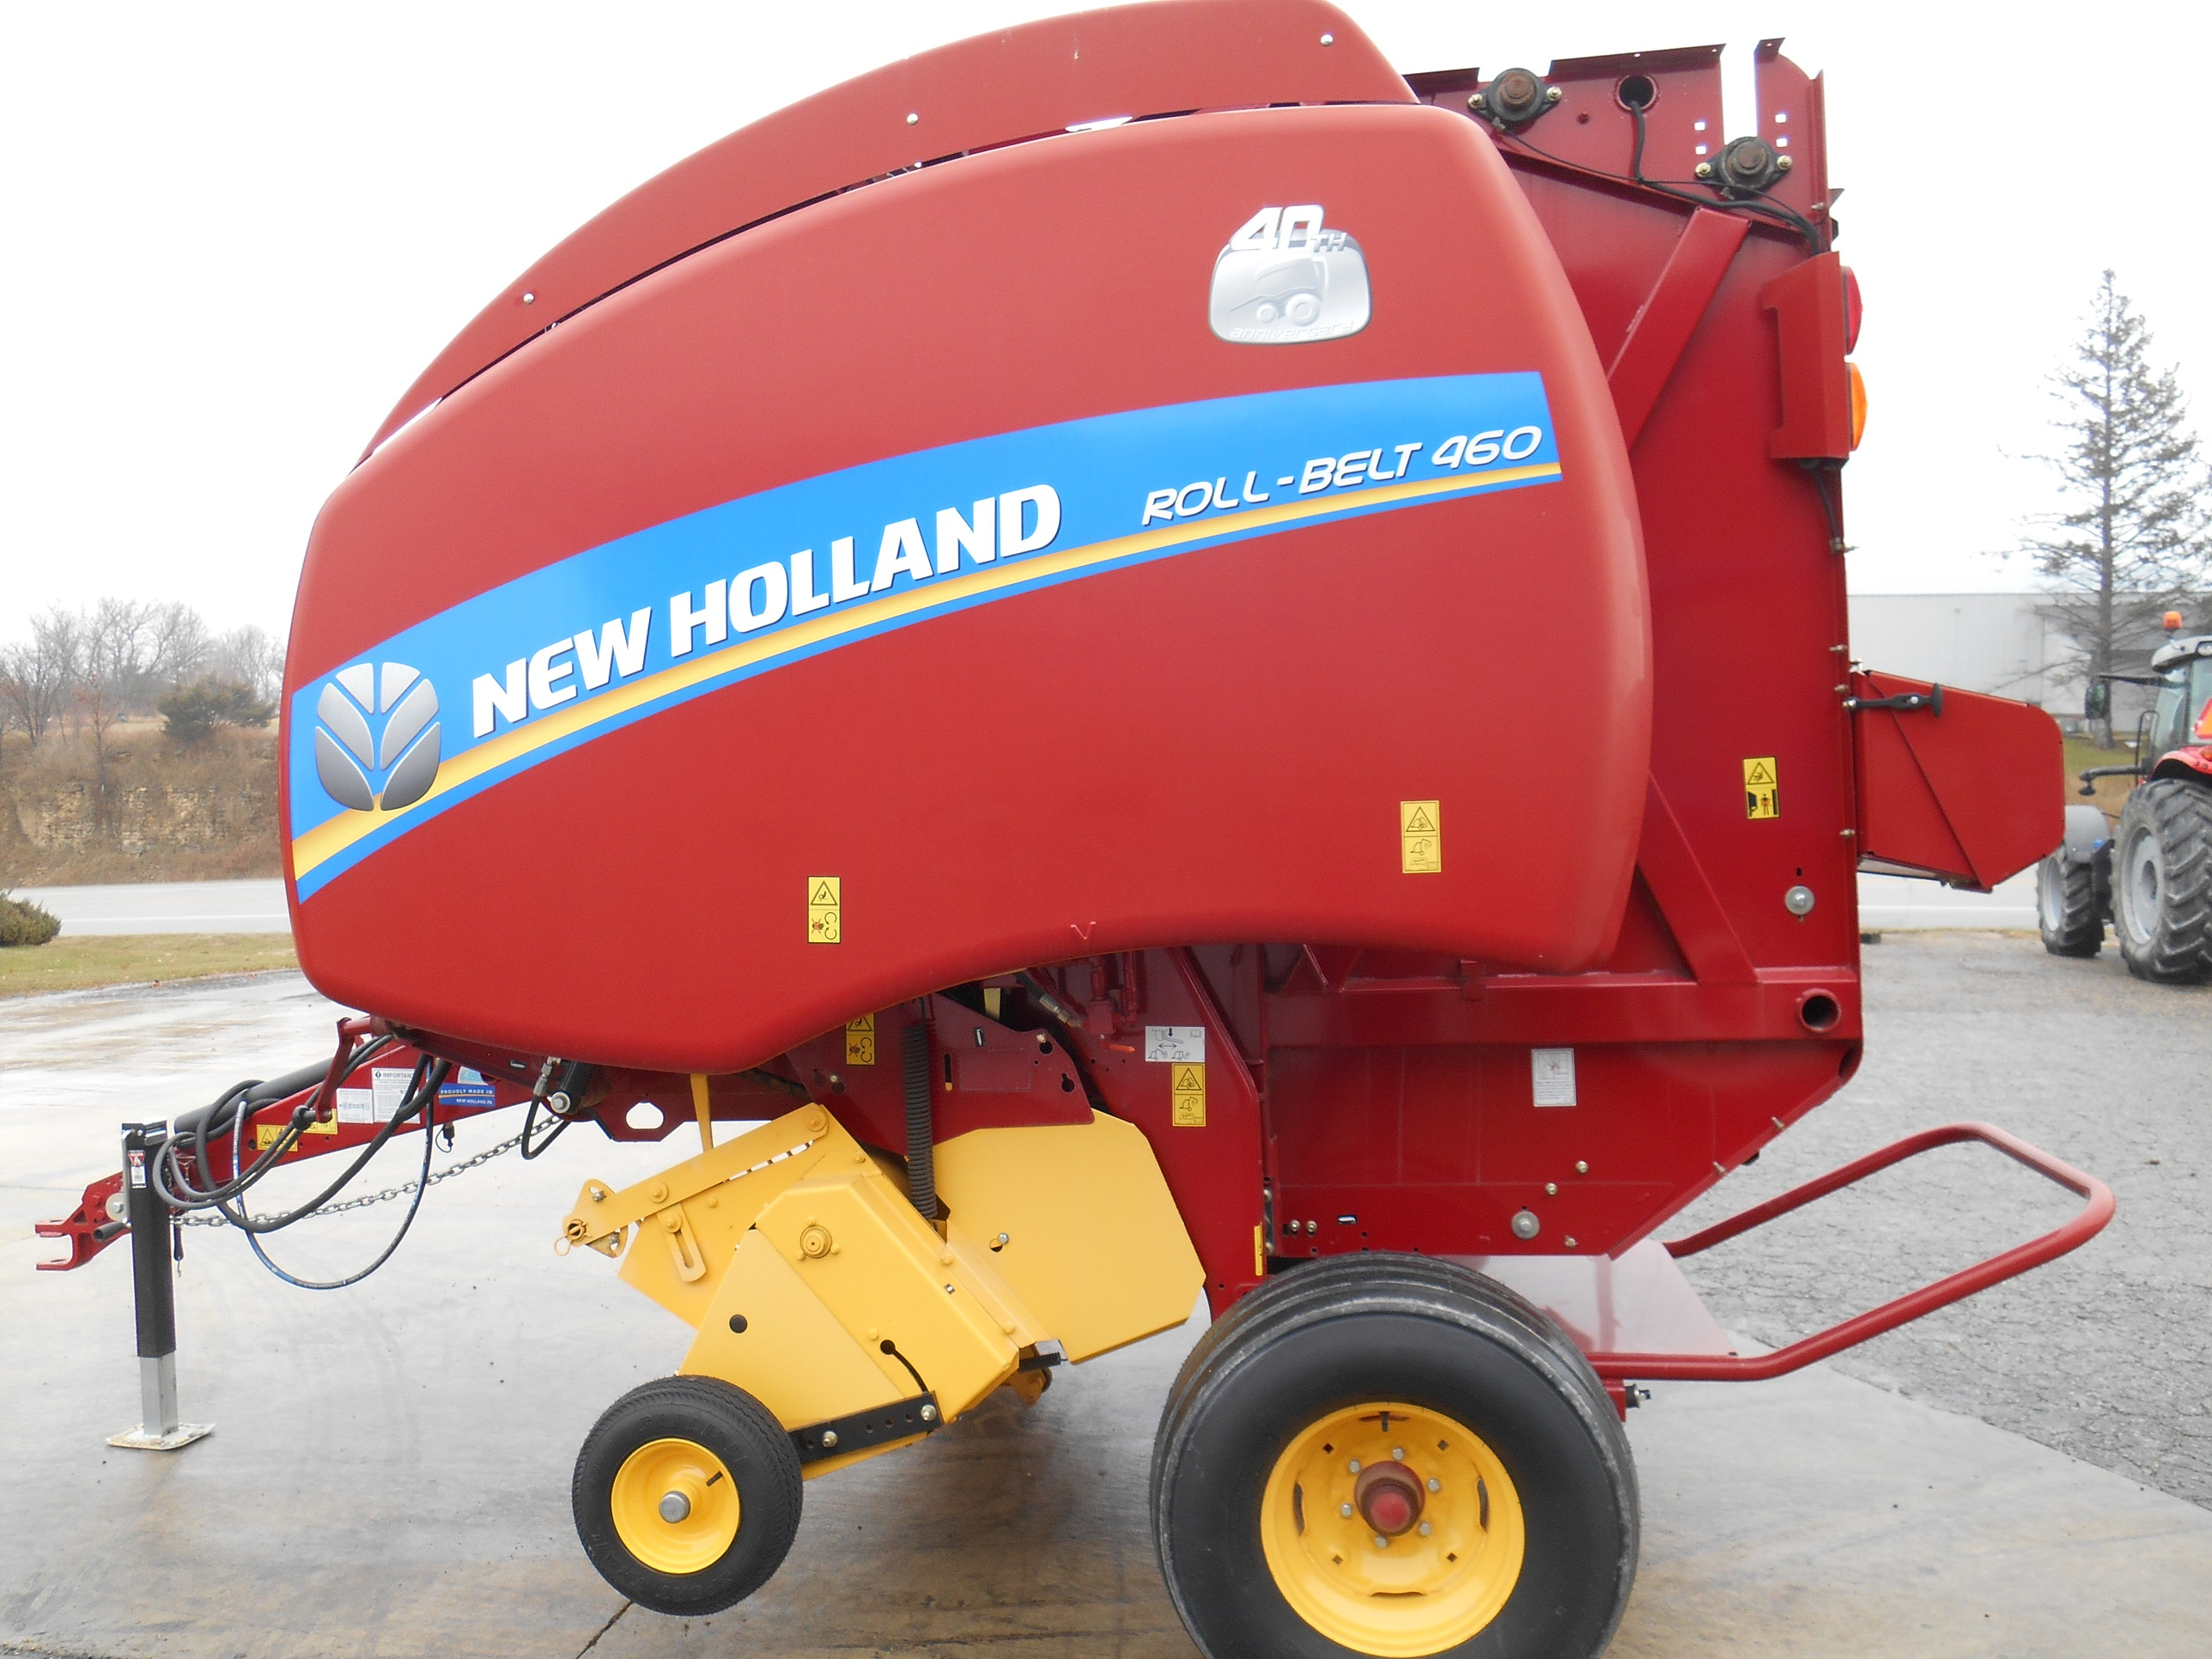 2015 New Holland Roll-Belt 460 Round Baler